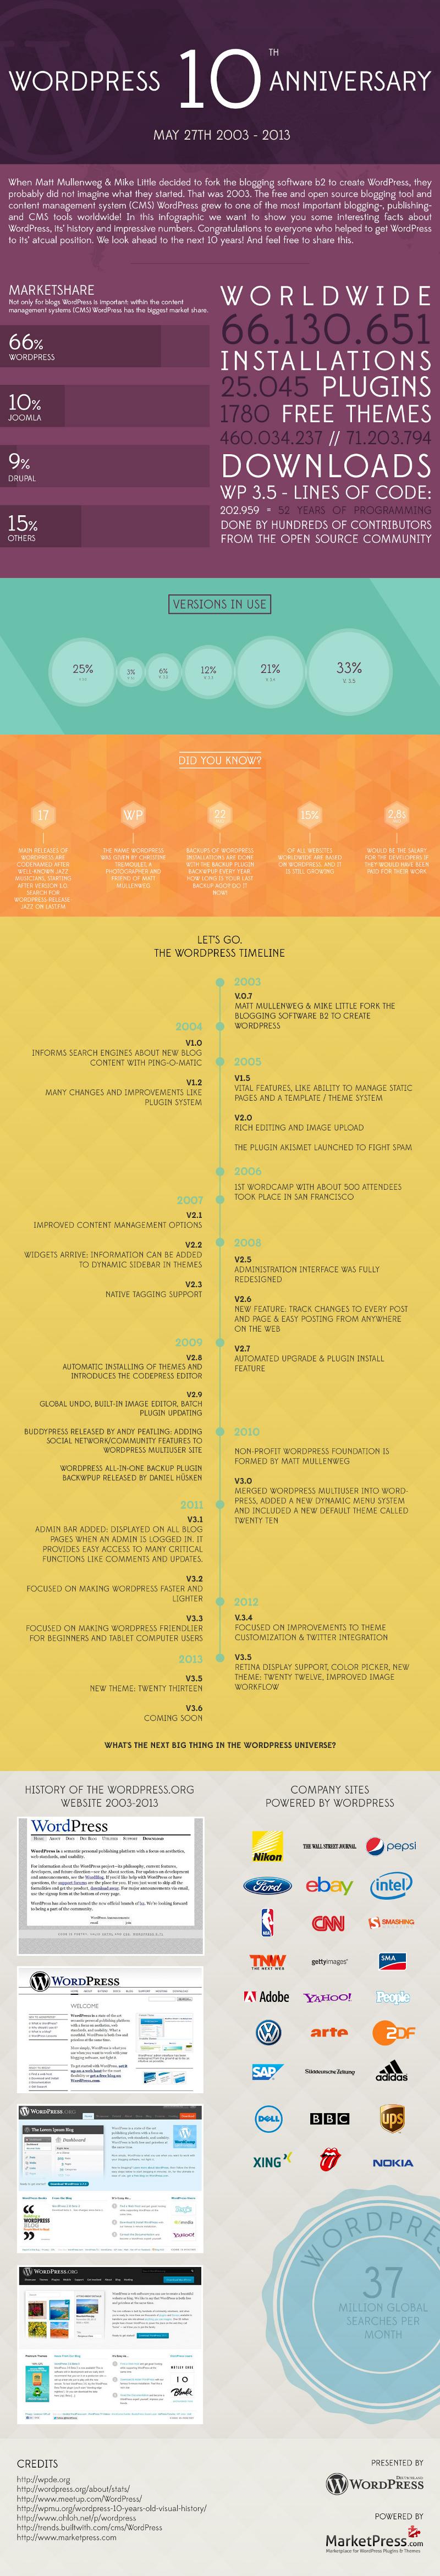 History Timeline of WordPress